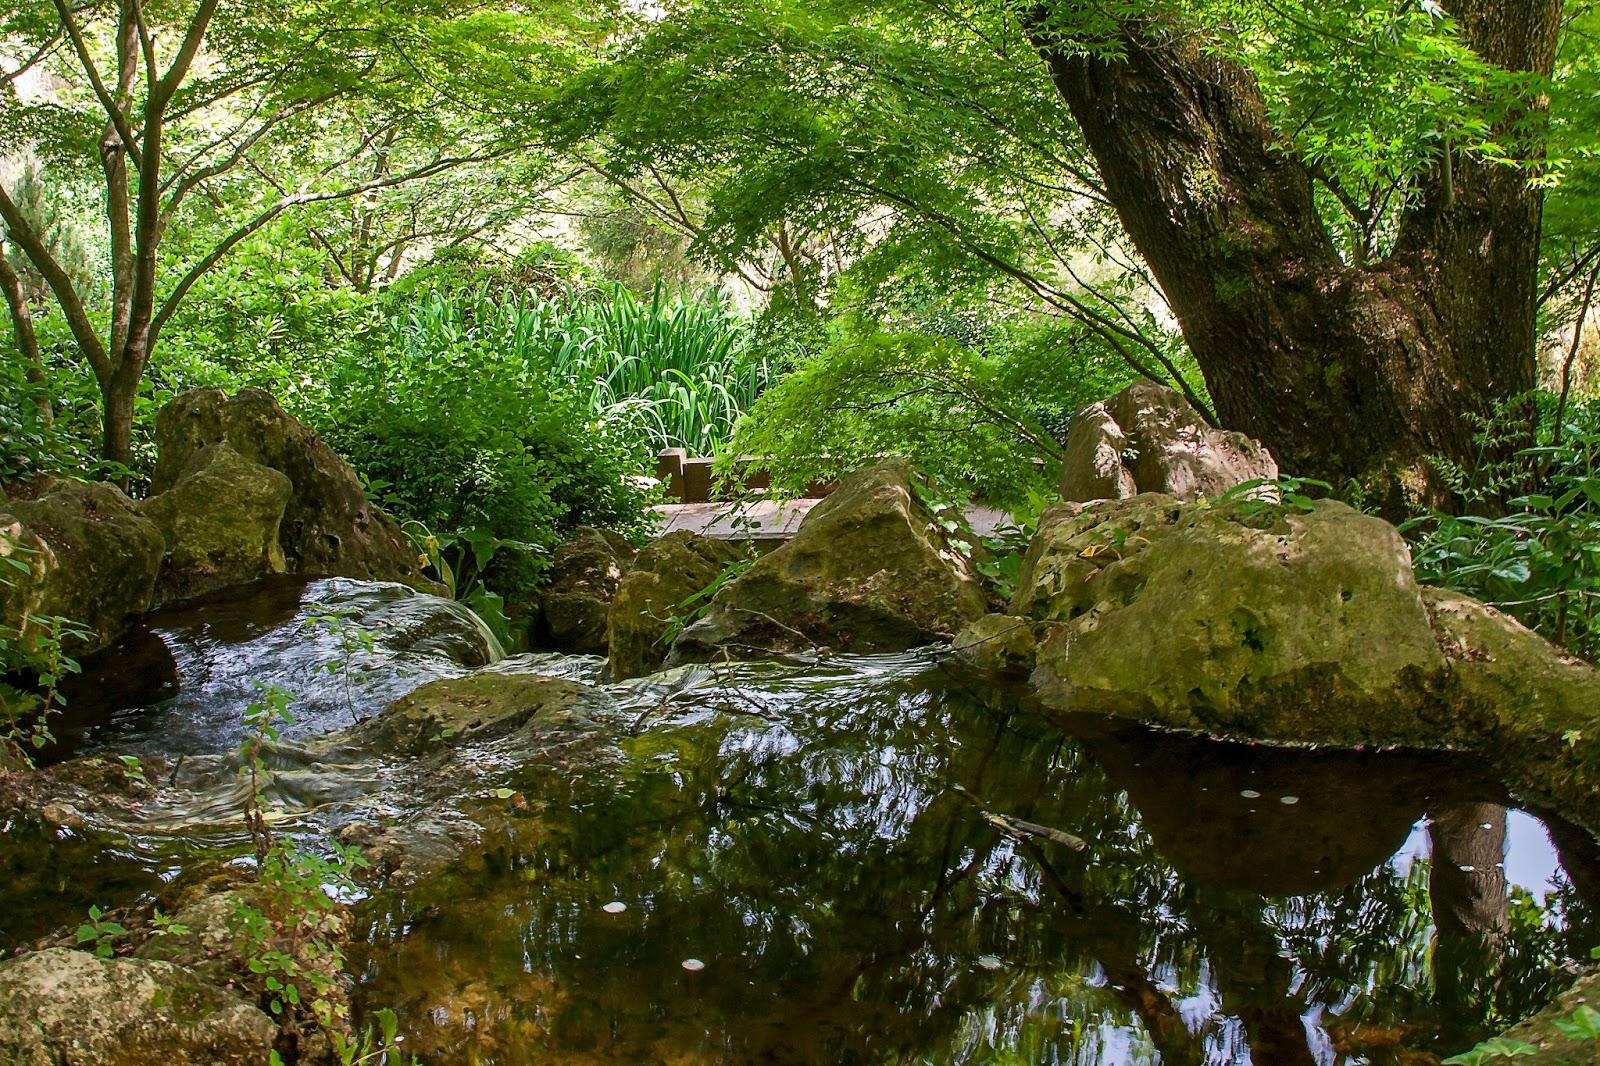 Fotografare i dintorni di roma orto botanico roma for Laghetti nei giardini